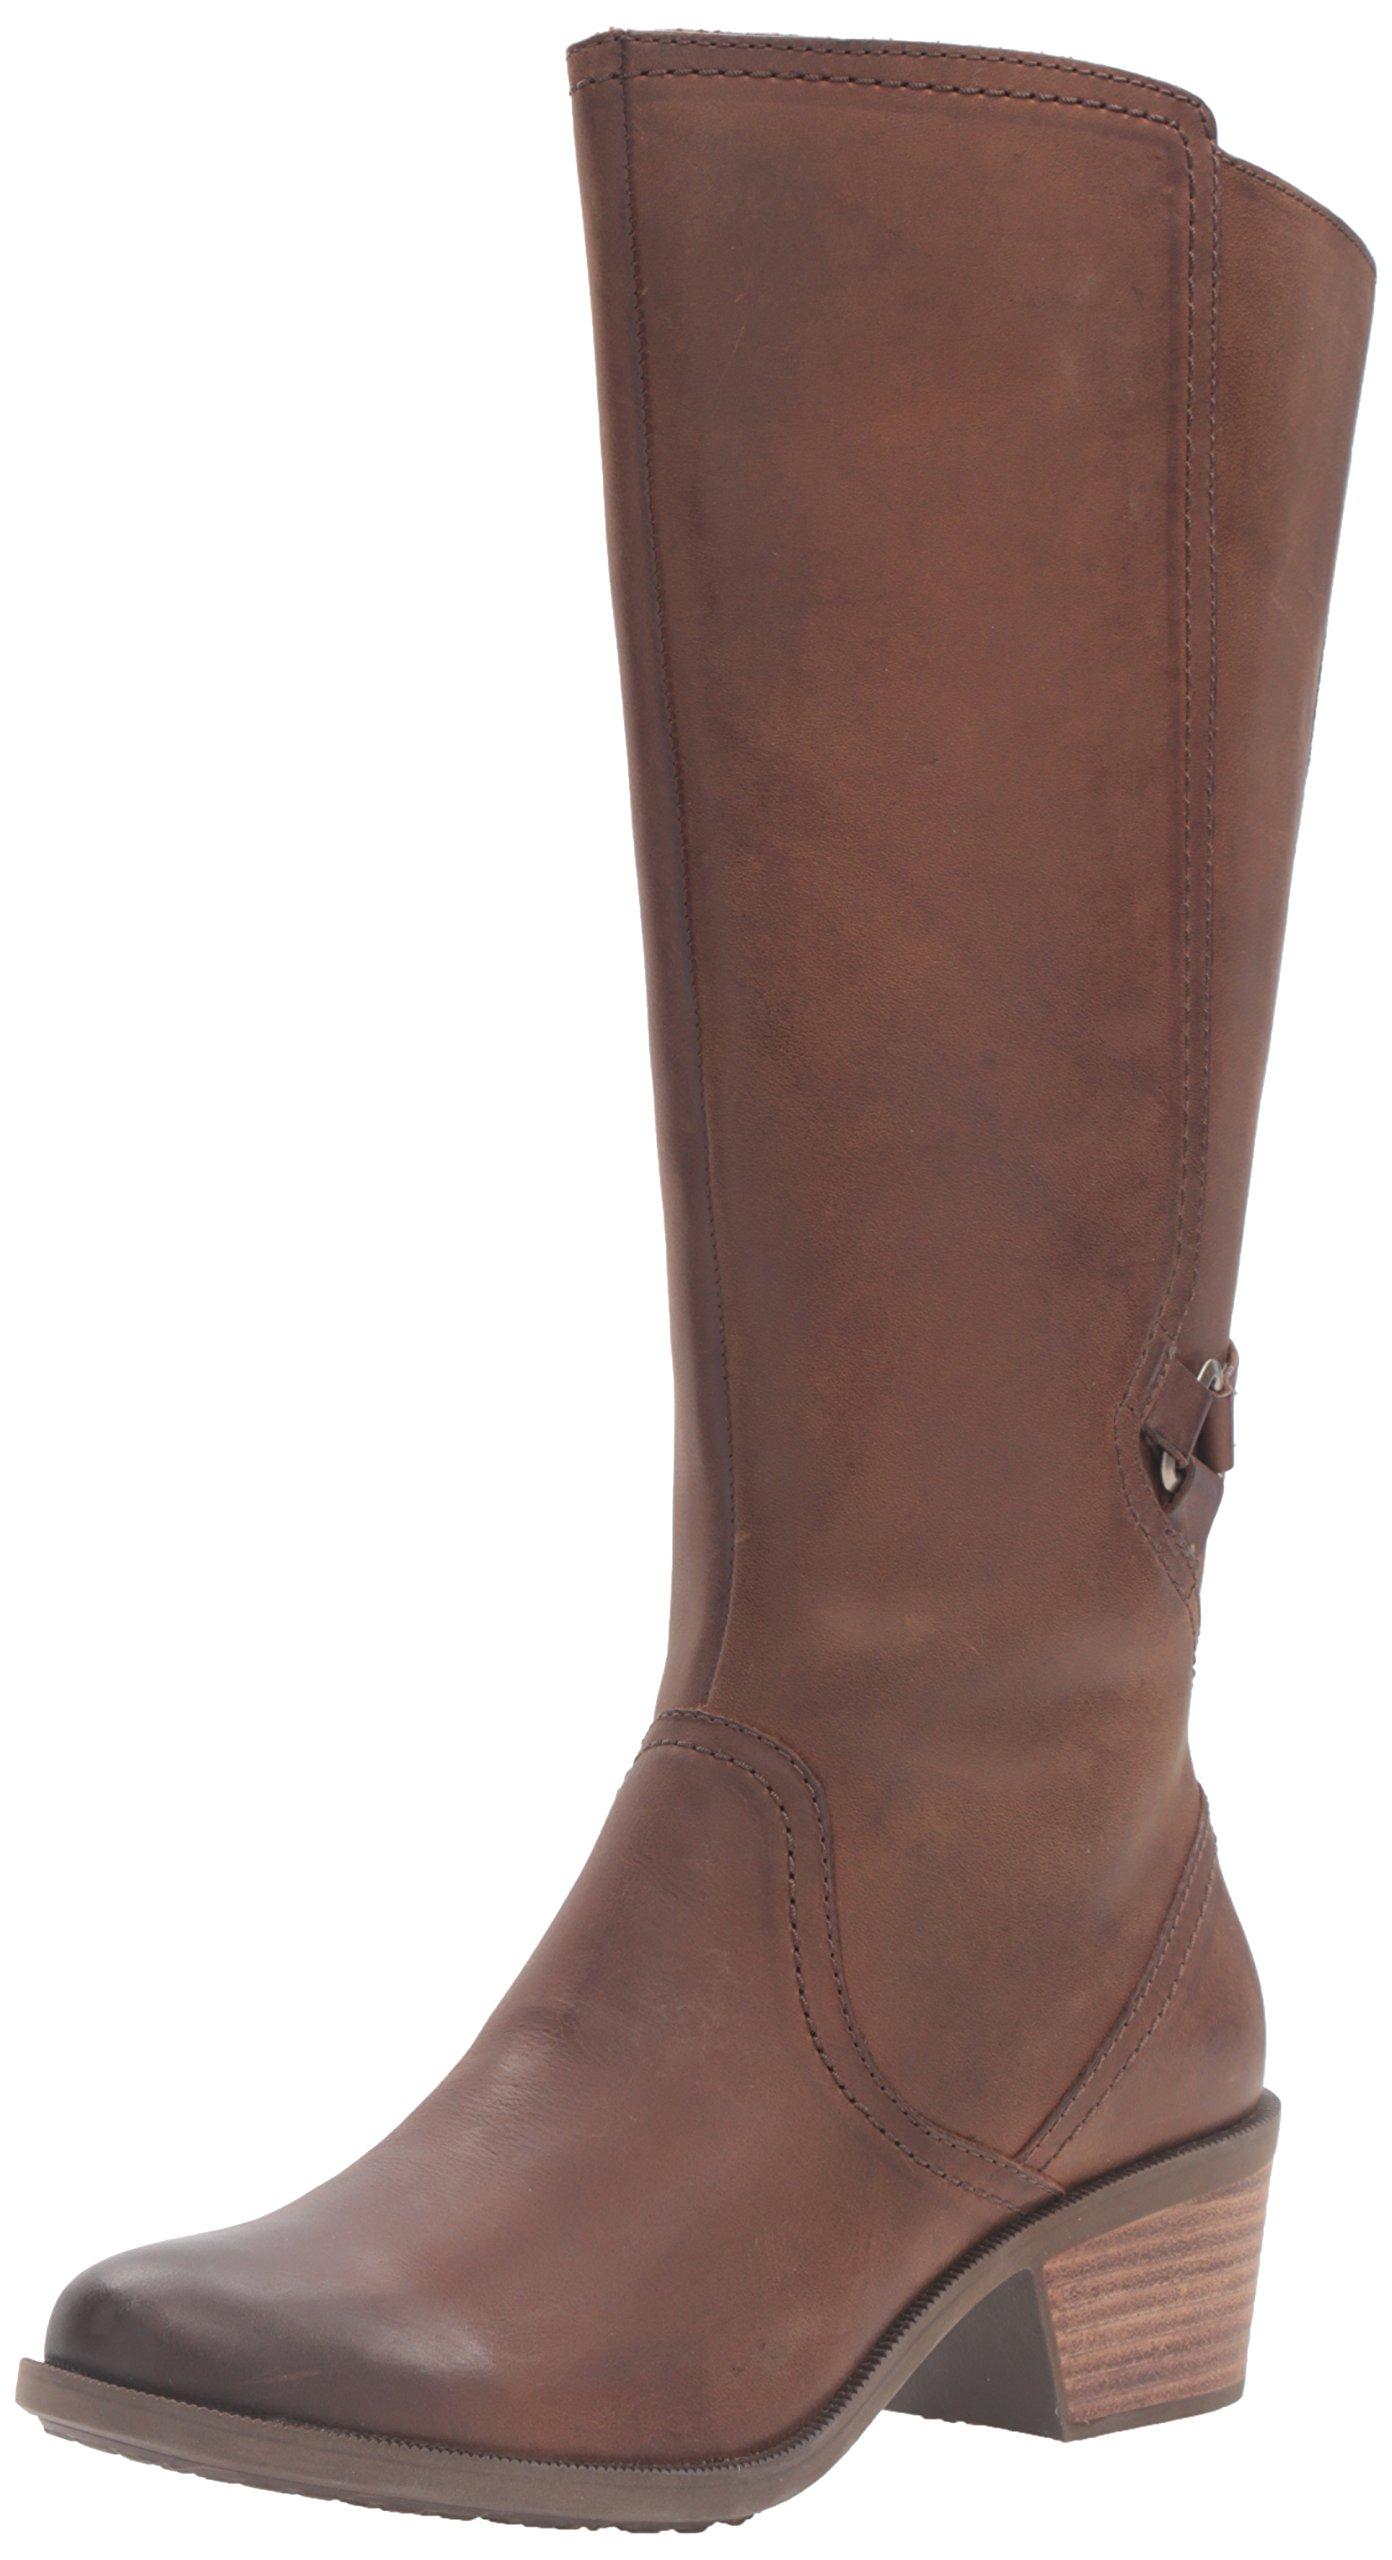 Teva Women's W Foxy Tall Leather Boot,Brown,7.5 M US